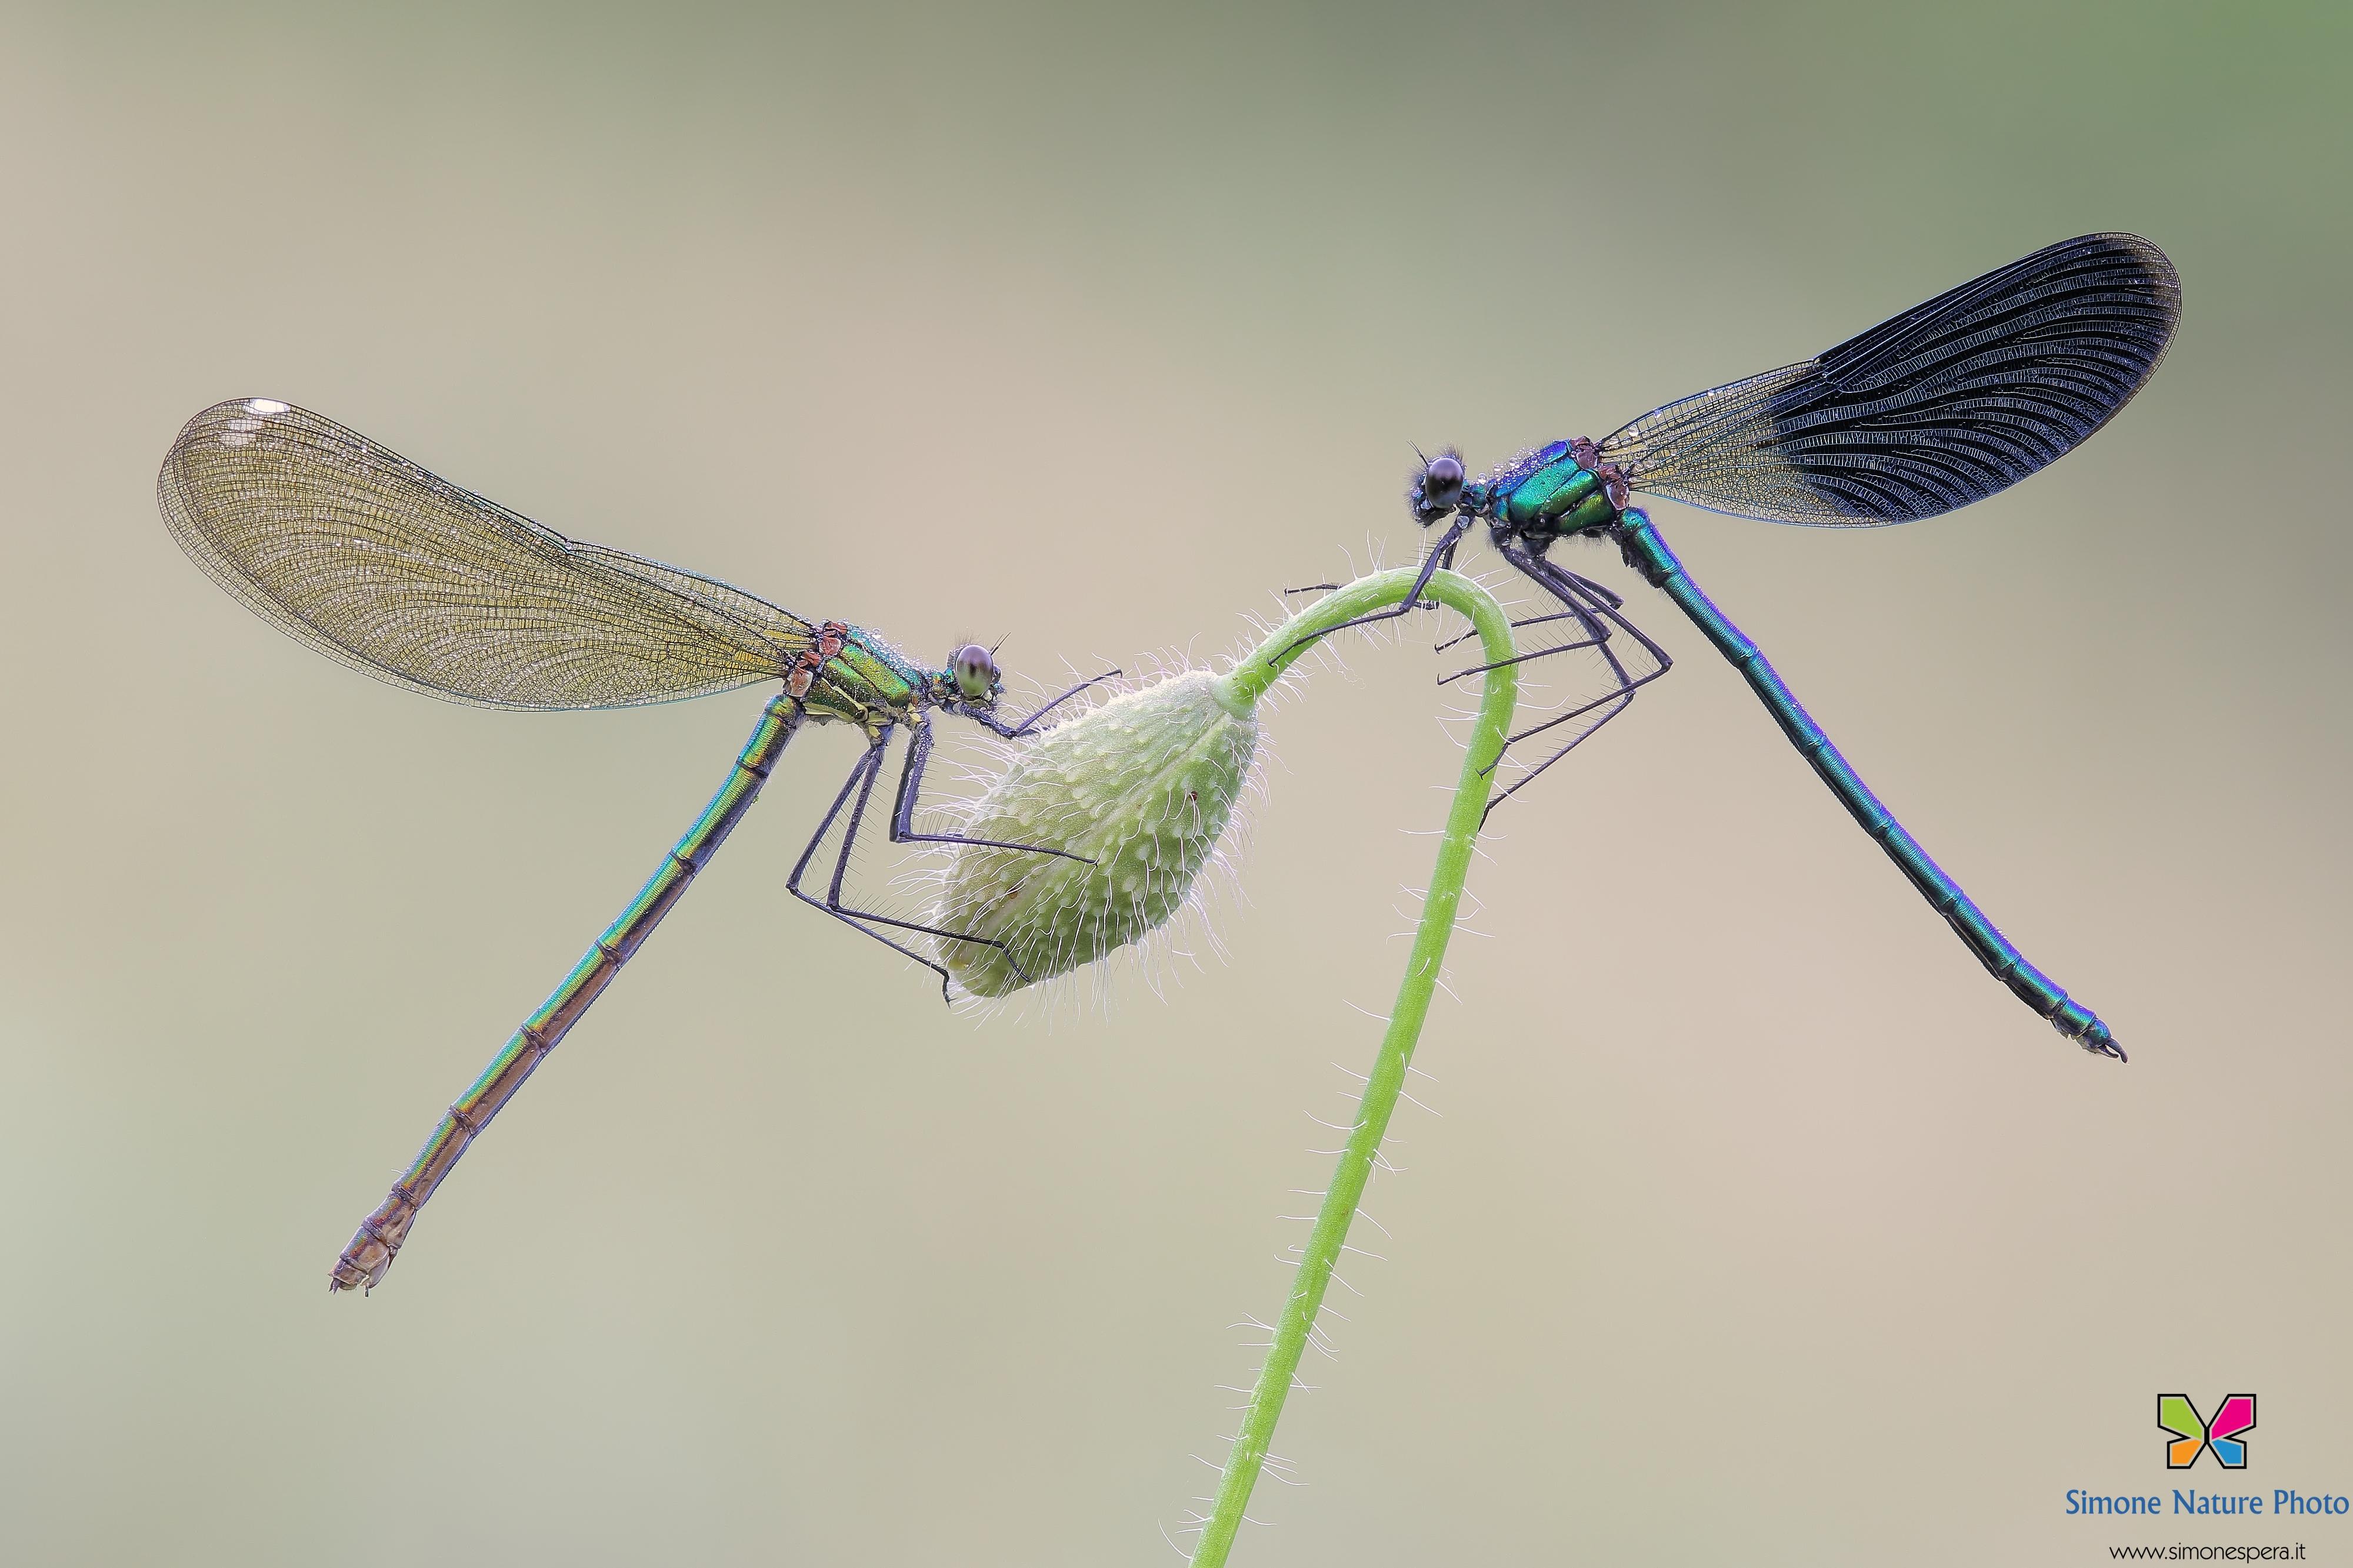 Calopteryx splendens (Harris, 1780)